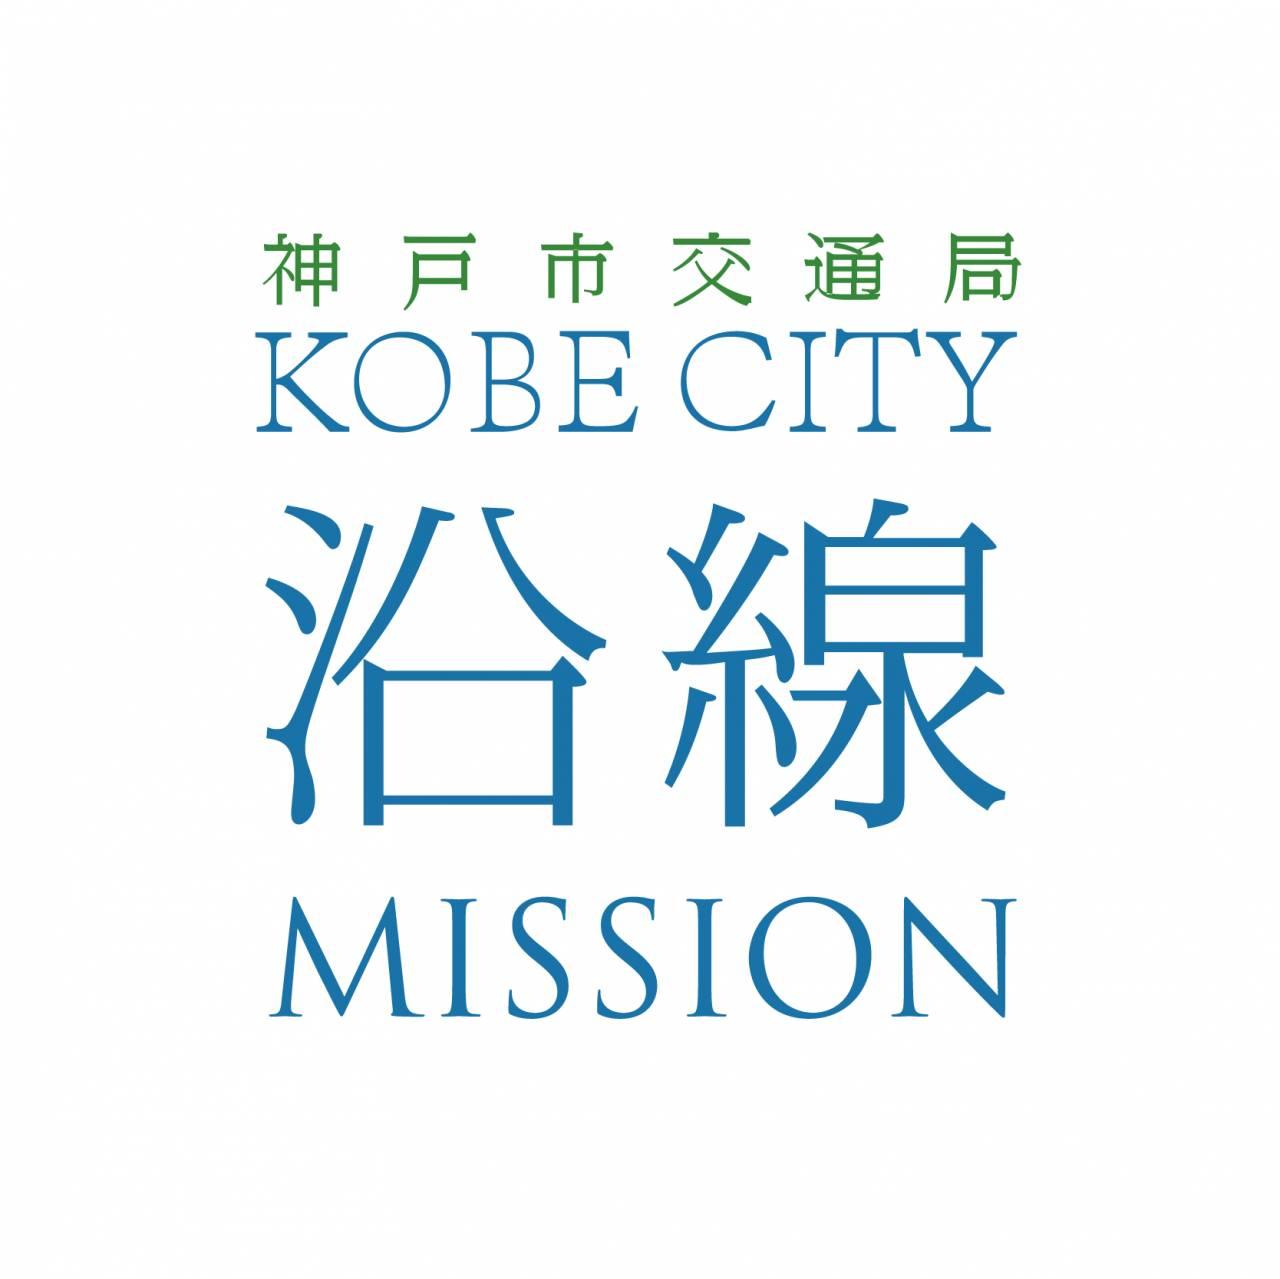 KOBE沿線MISSION